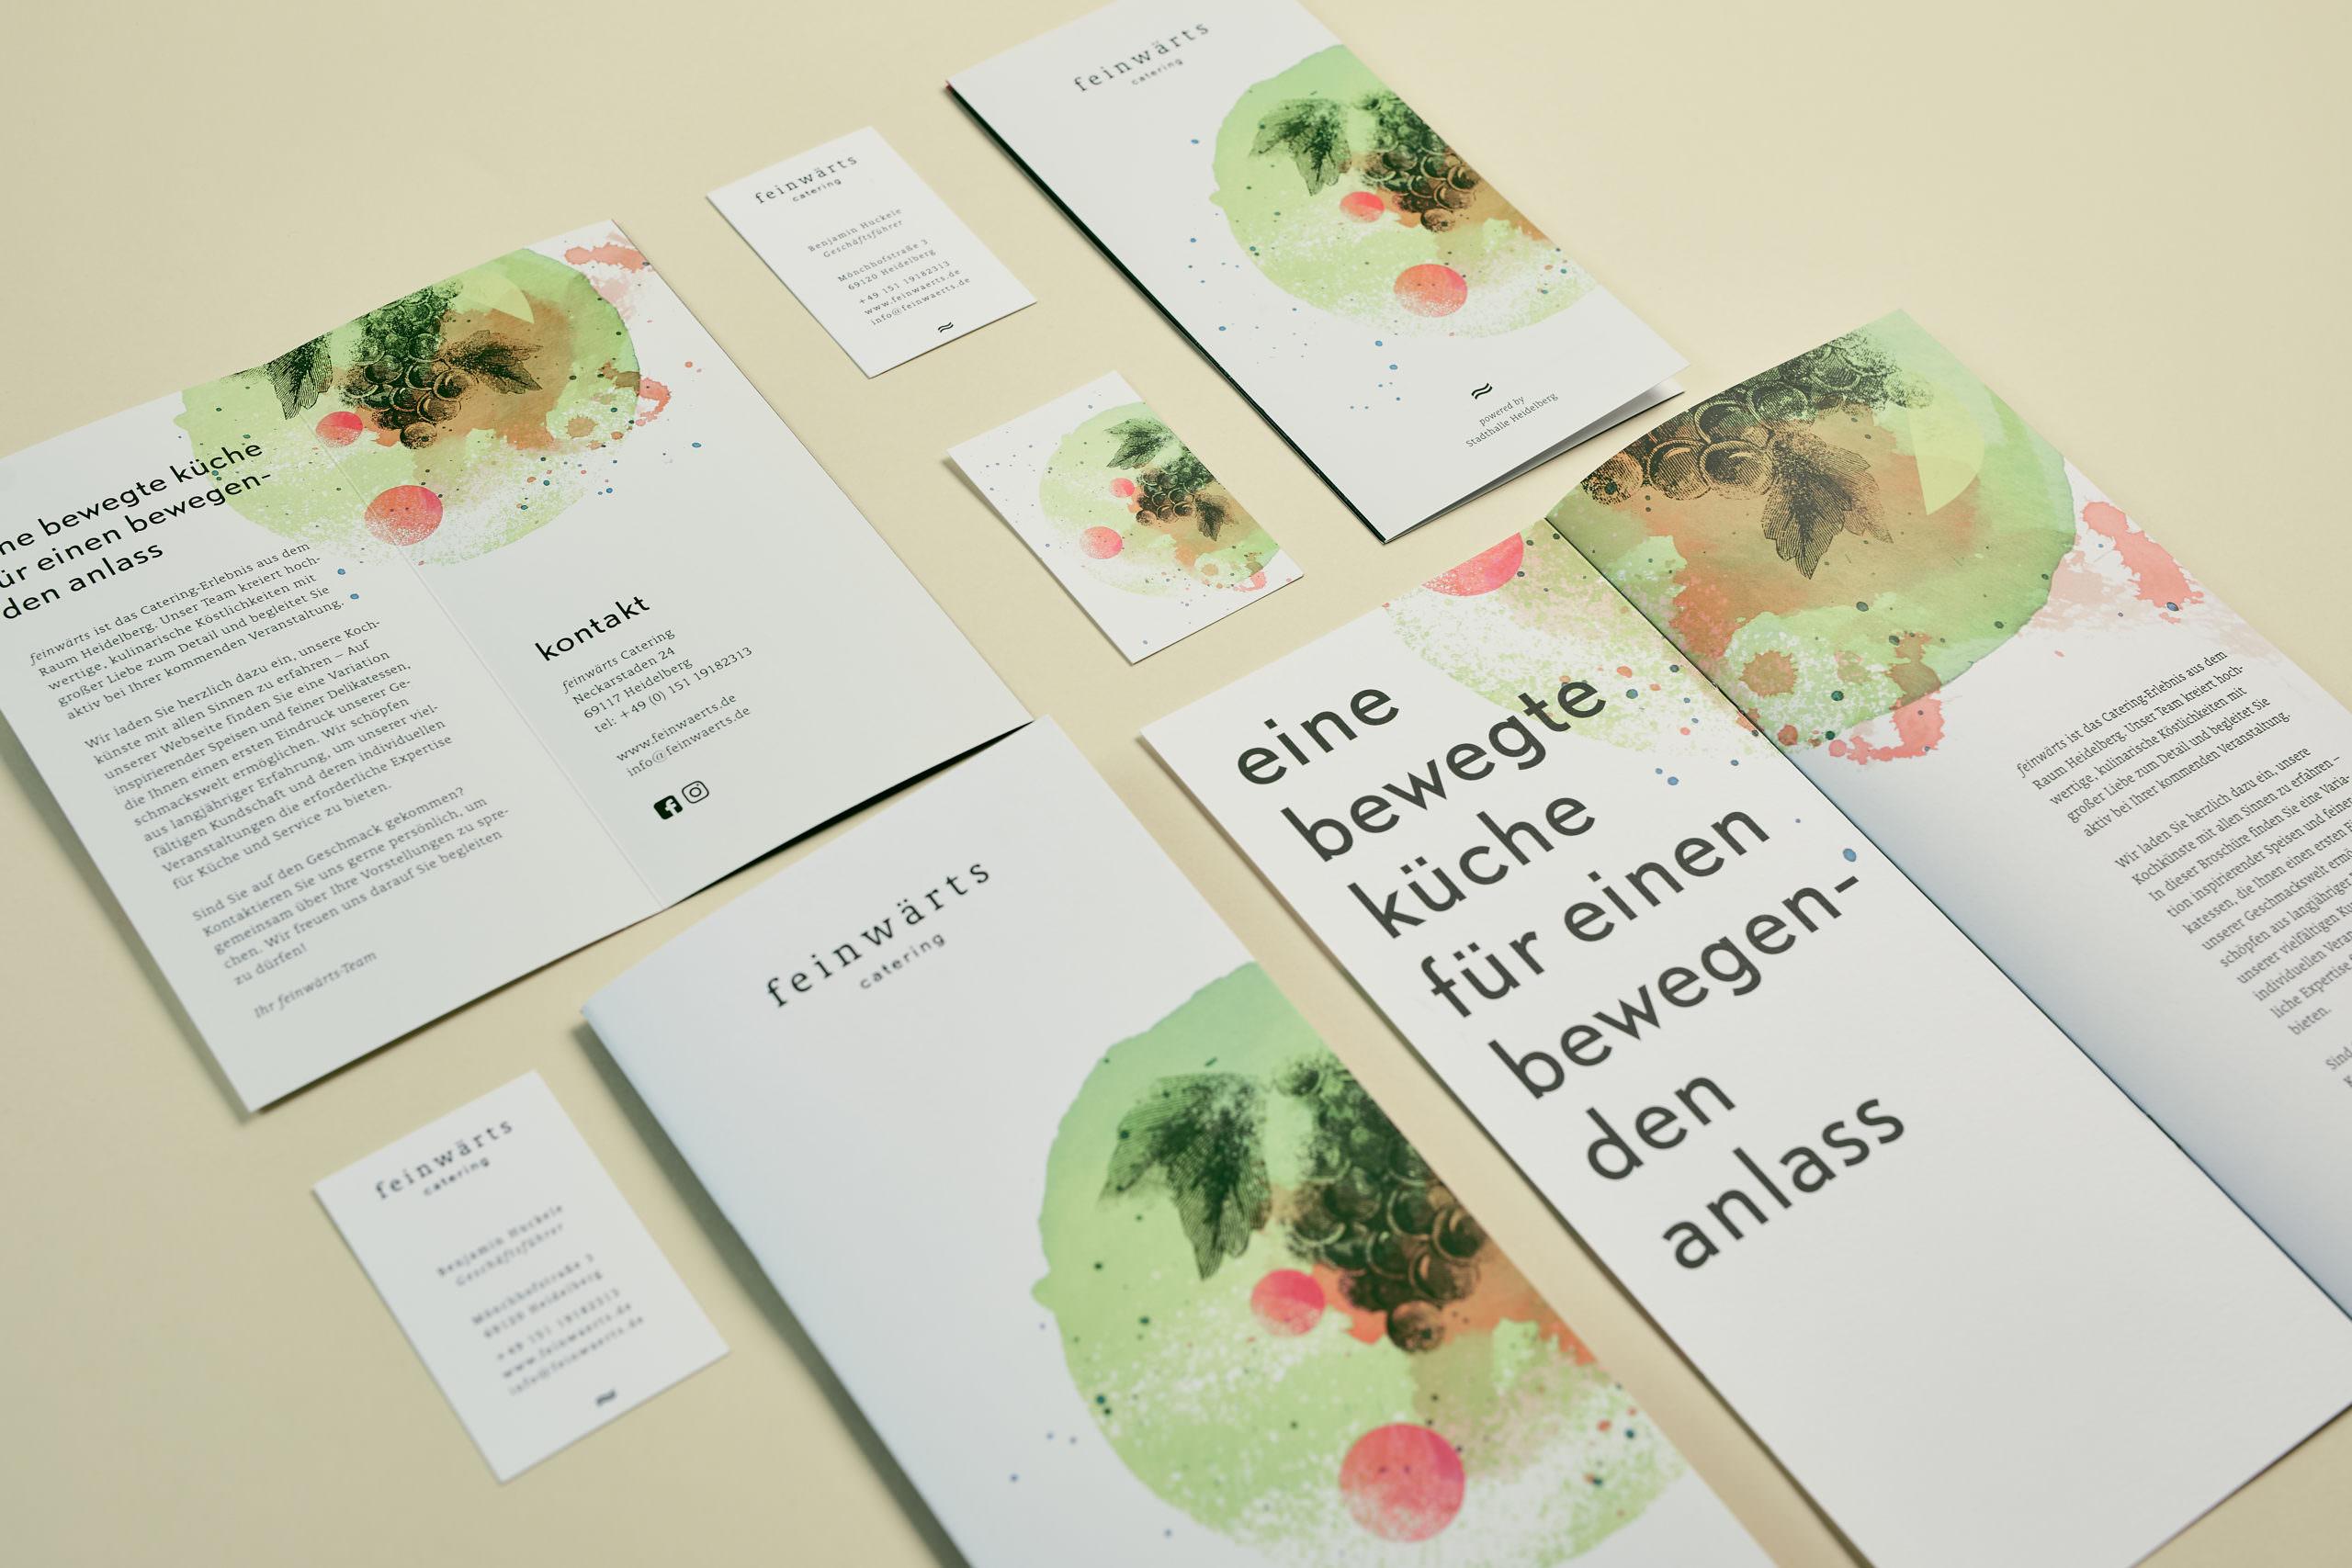 https://lauramorgenstern.de/wp-content/uploads/2019/08/laura-morgenstern_waldpark-feinwaerts.jpg